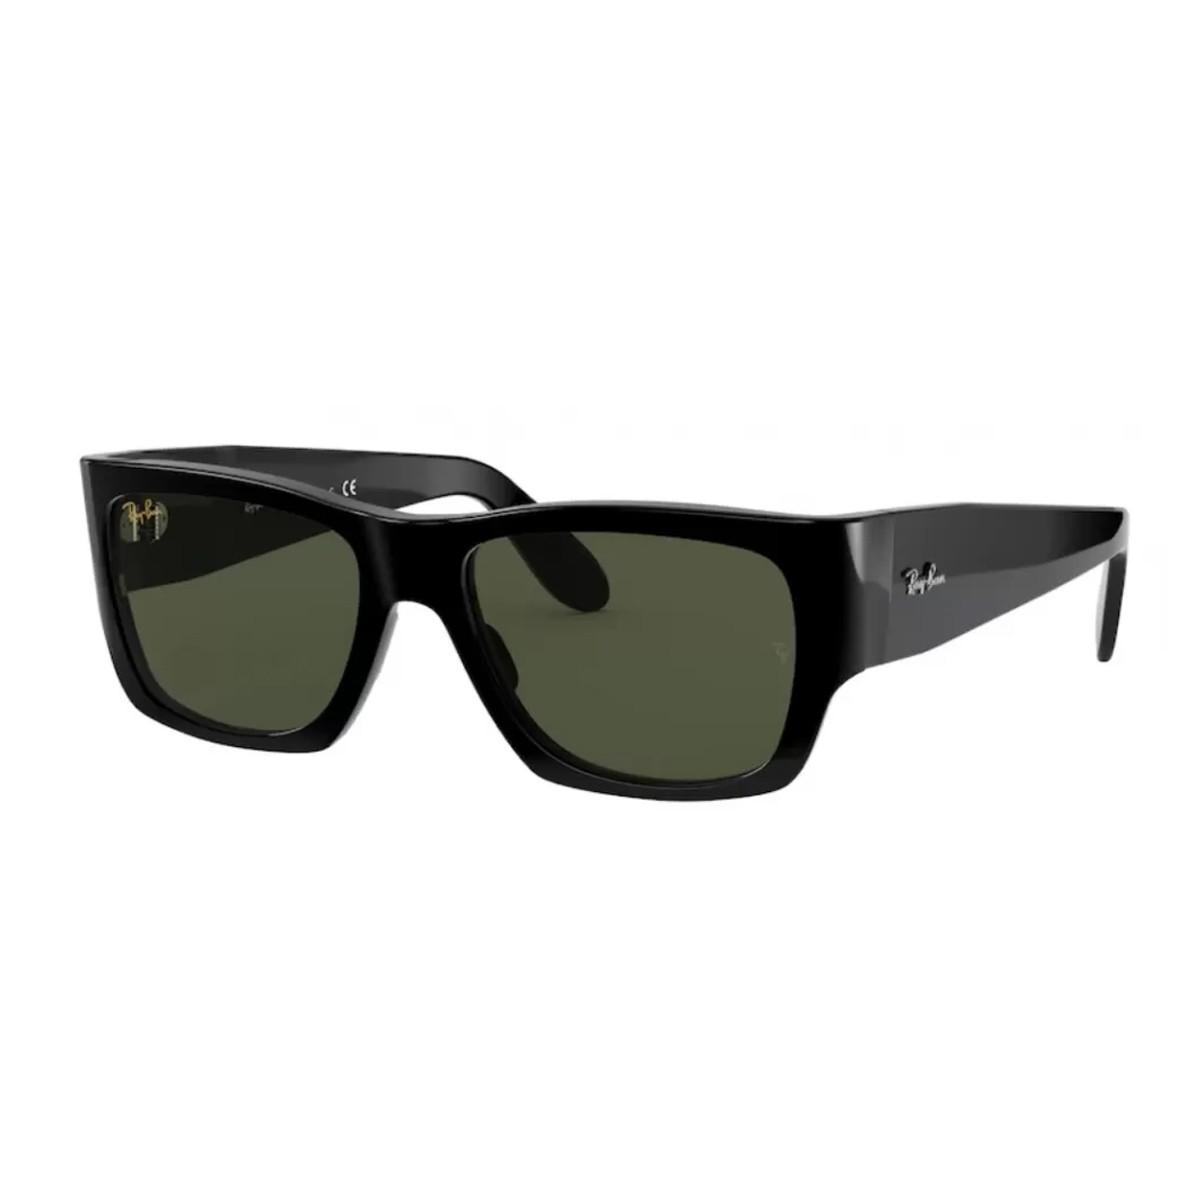 Ray-Ban Nomad RB2187 | Unisex sunglasses